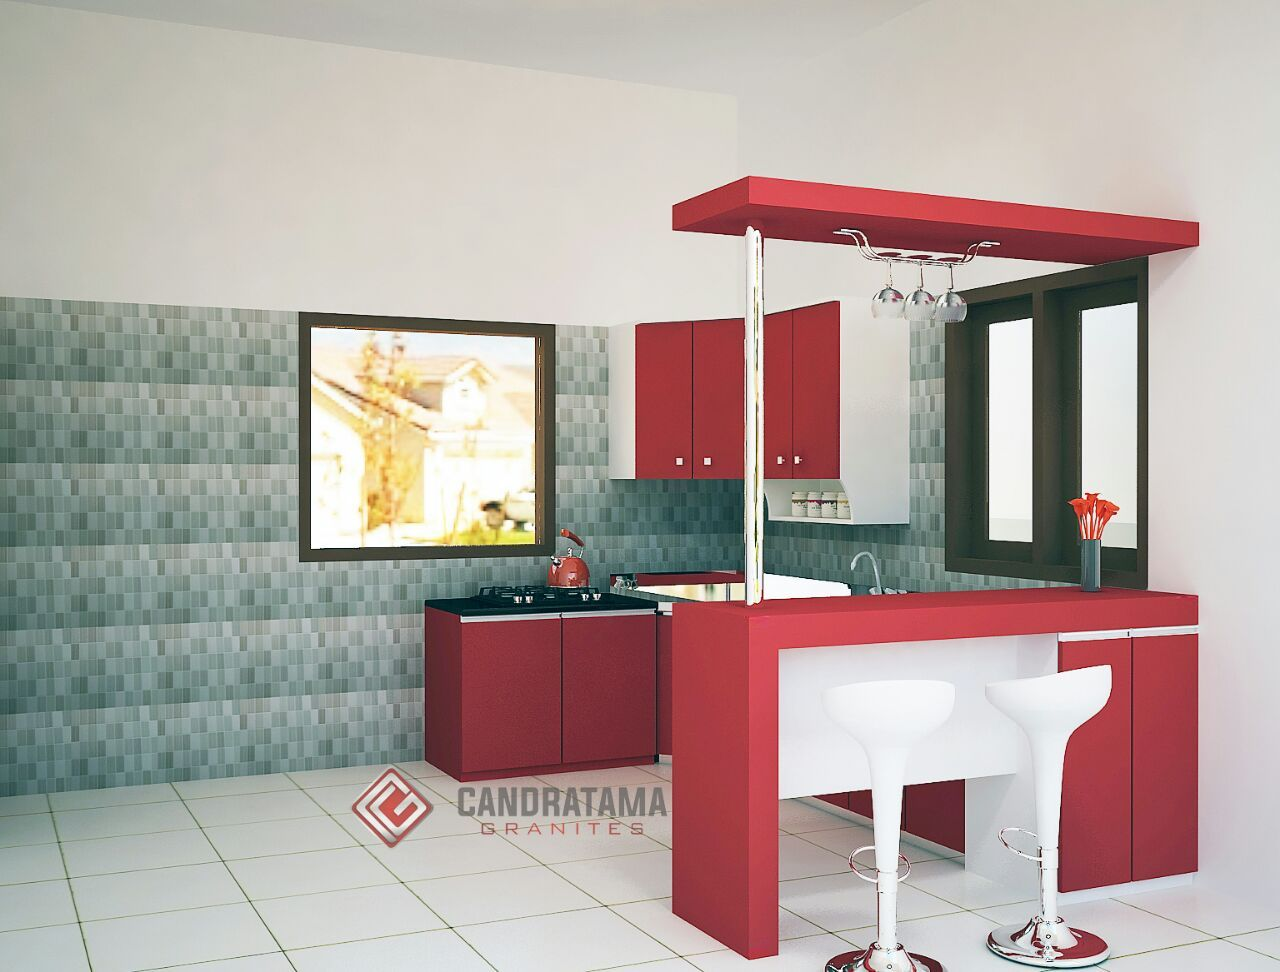 Interior kediri interior jombang interior blitar interior nganjuk interior tulungagung interior